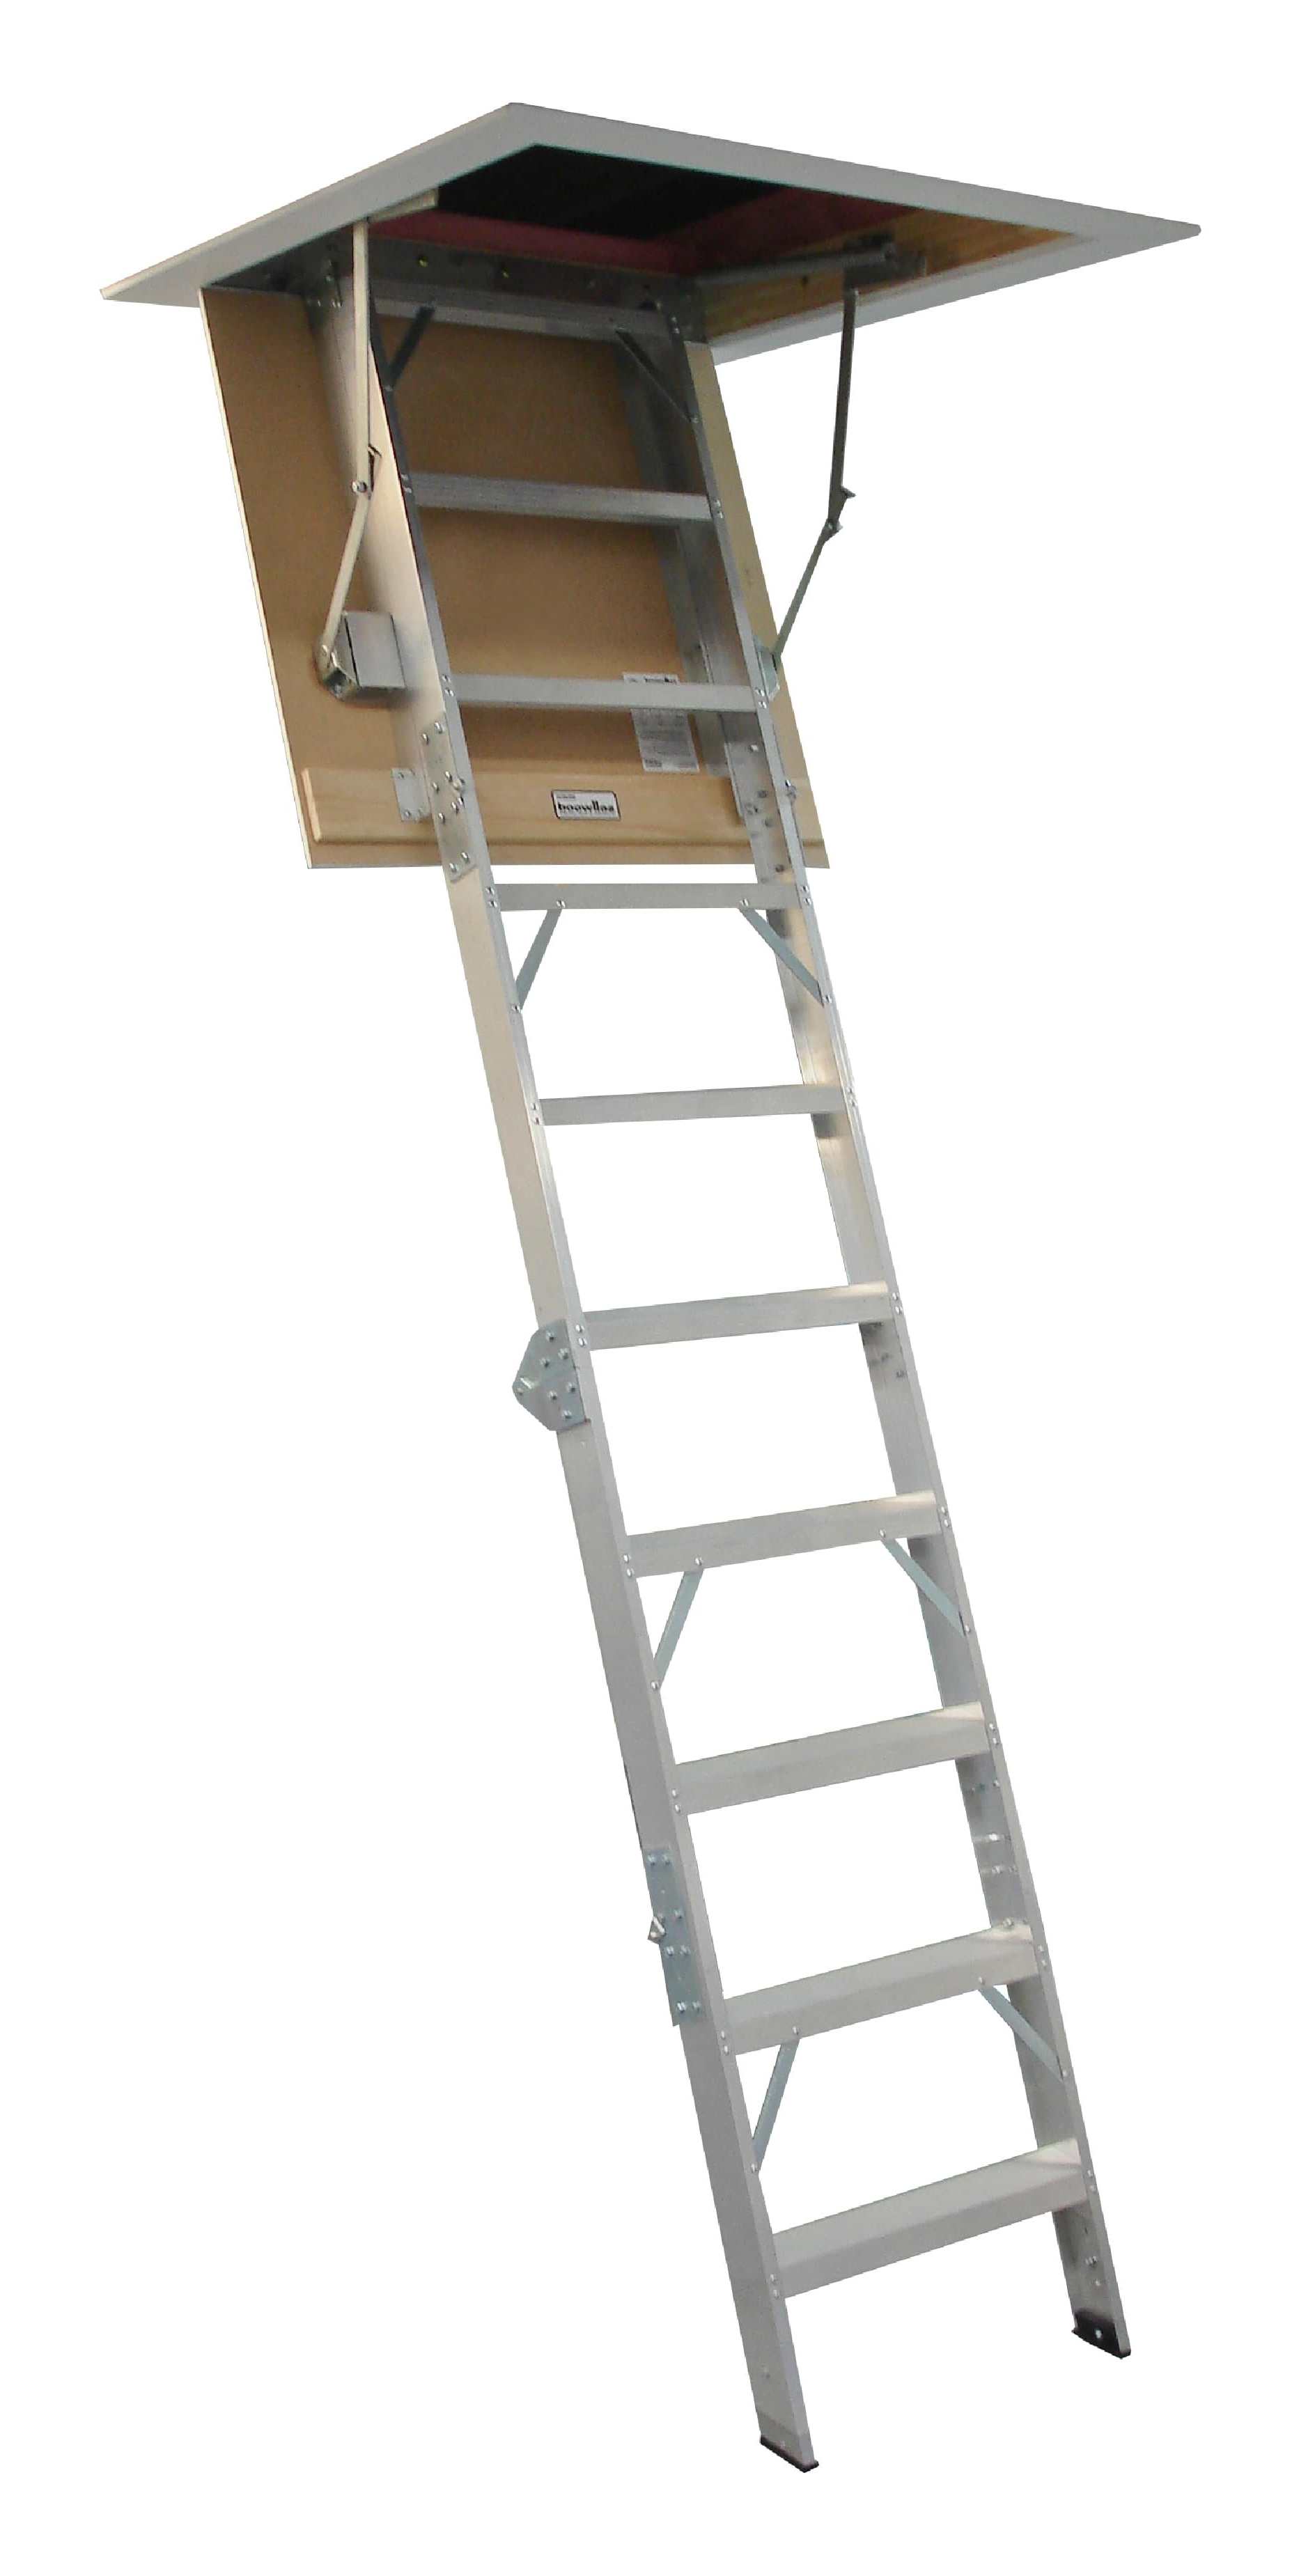 Sellwood M25 Attic Ladder